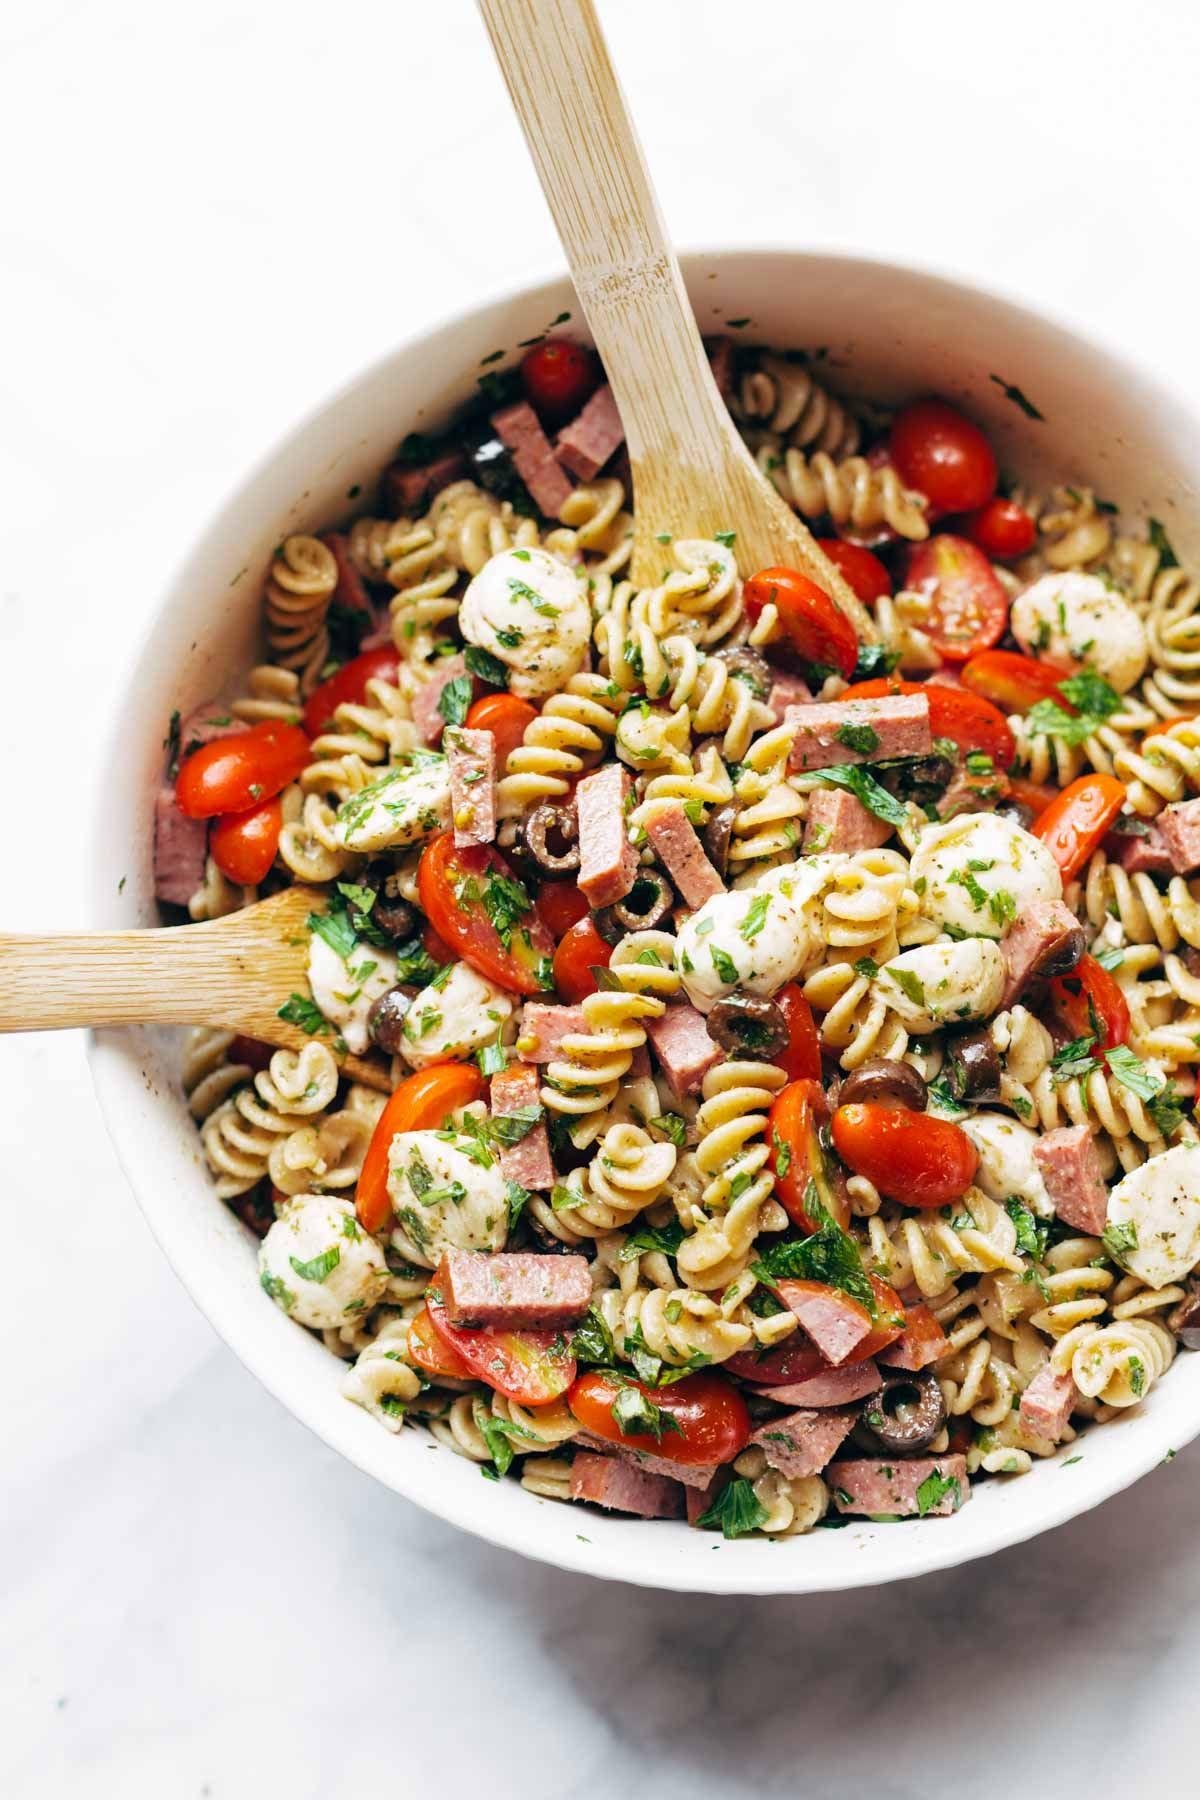 Easy Pasta Salad Recipes  Best Easy Italian Pasta Salad Recipe